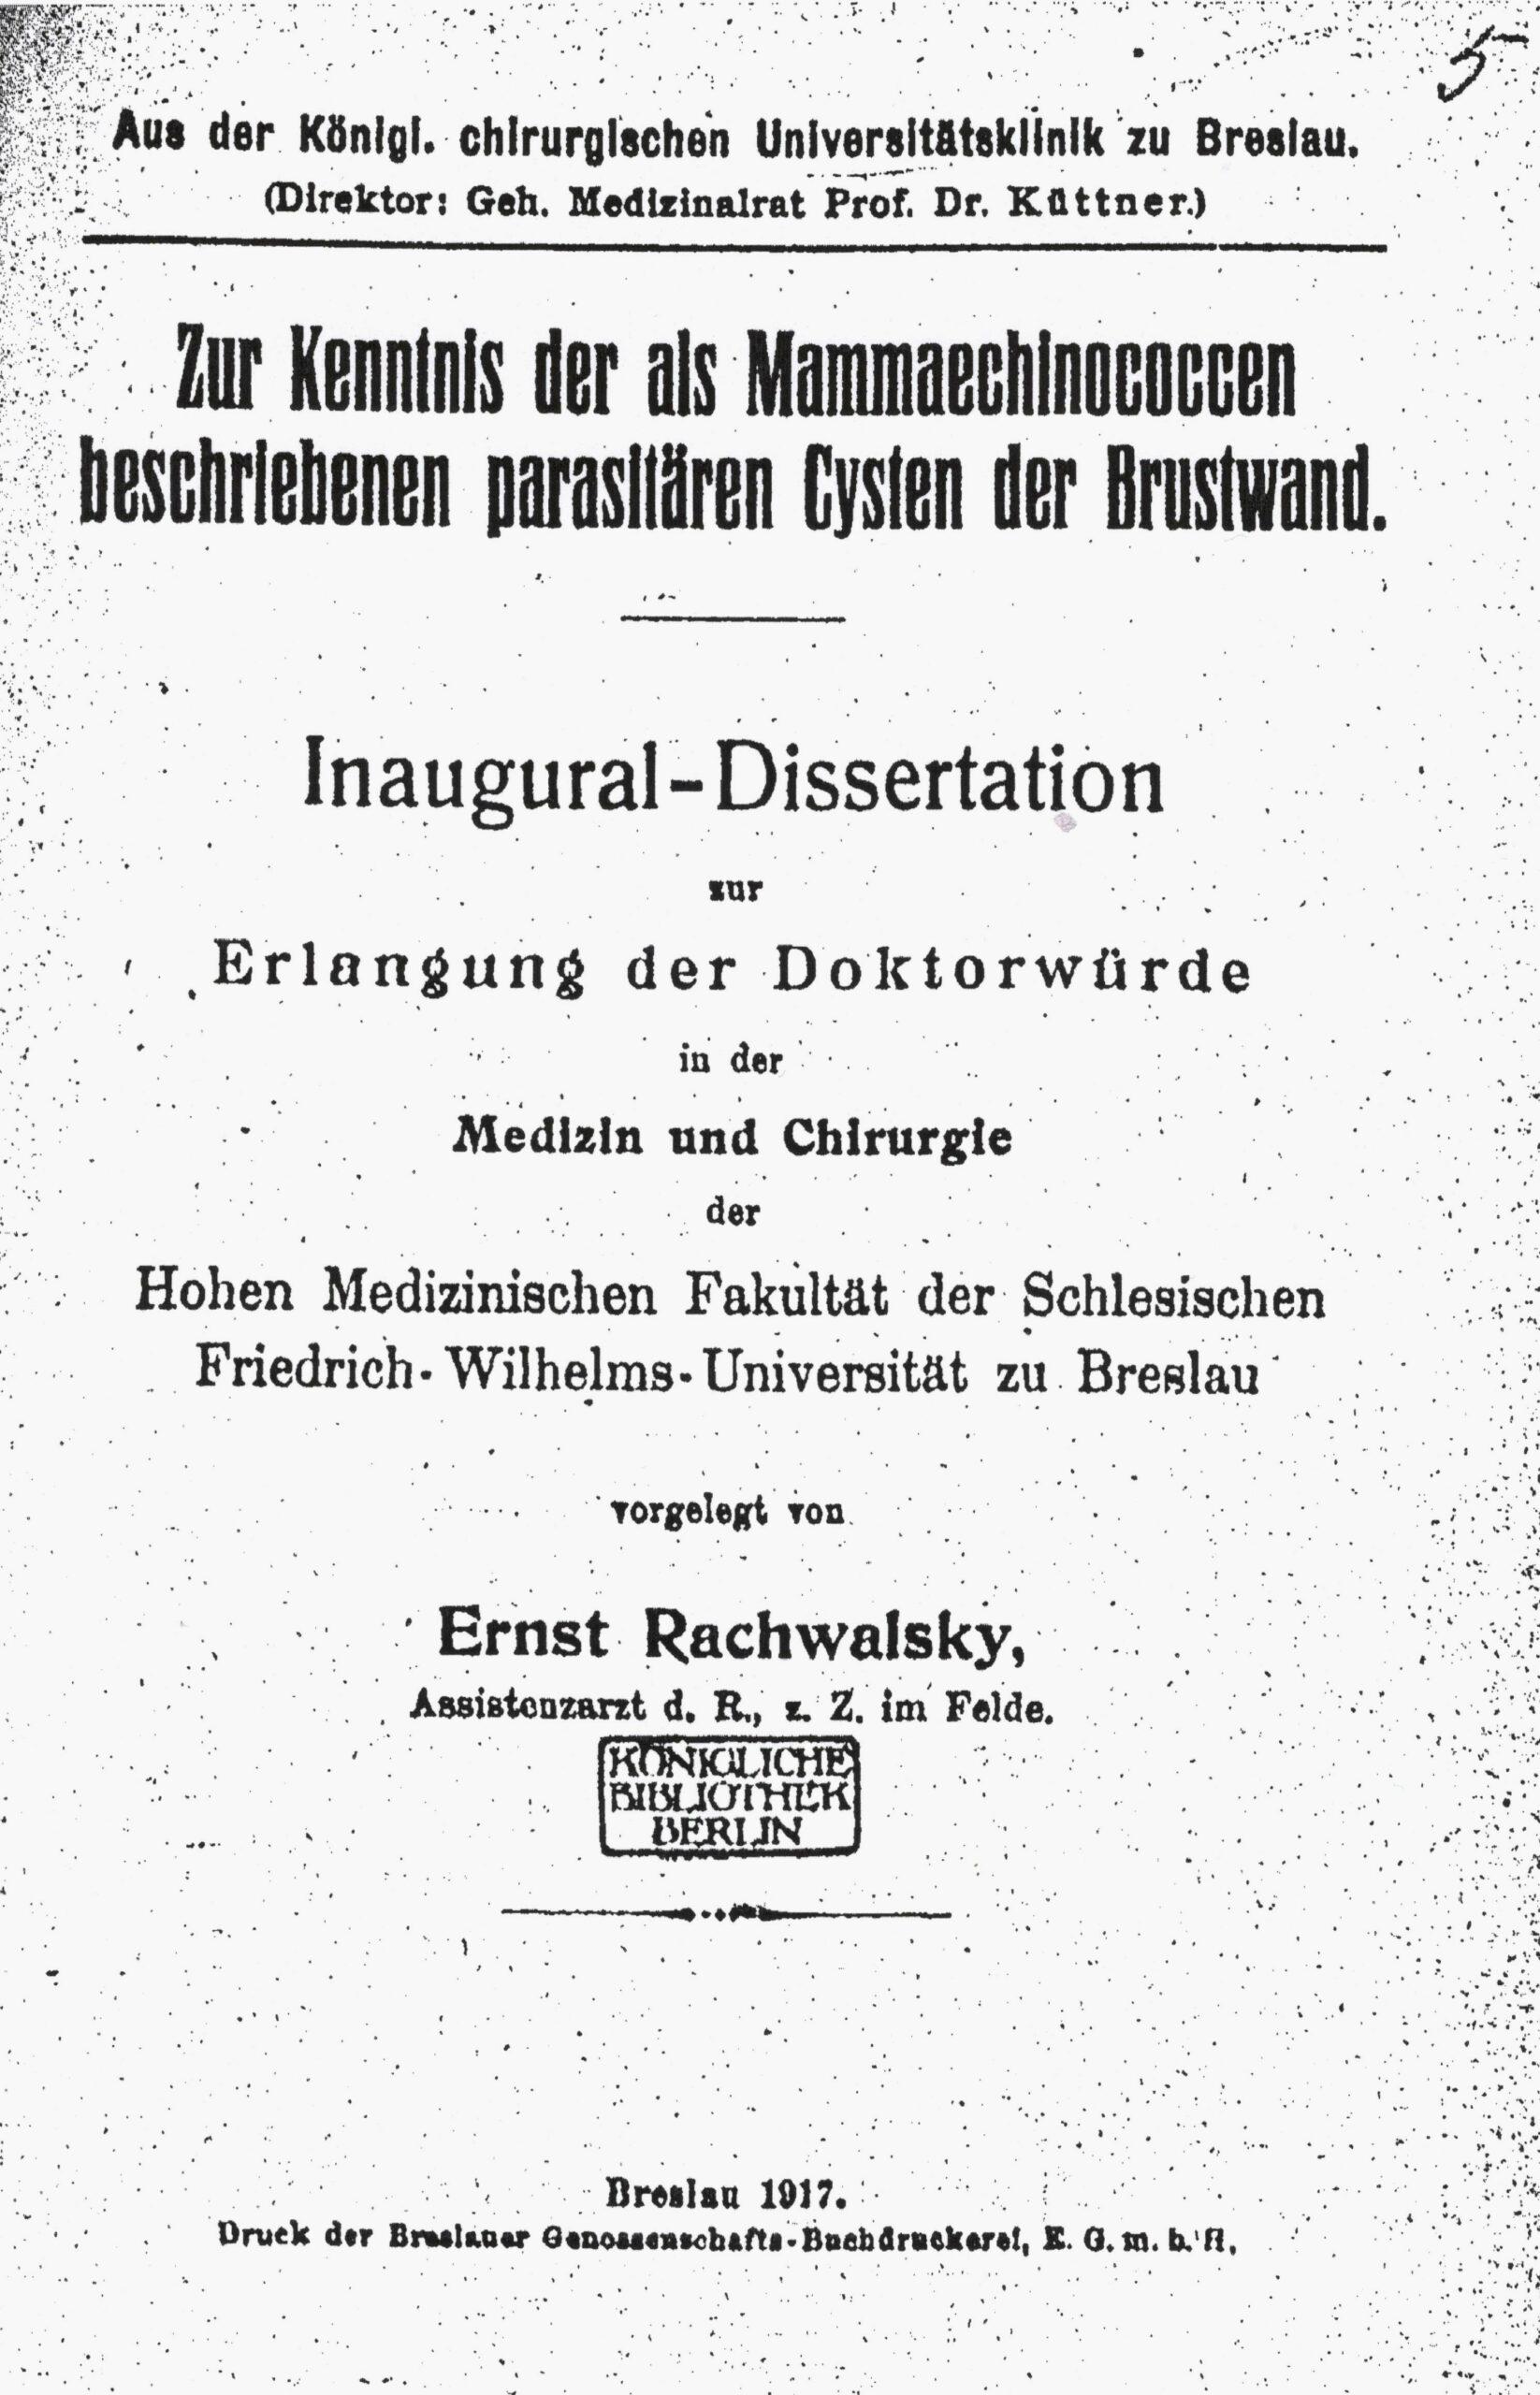 Dissertation, Breslau 1917